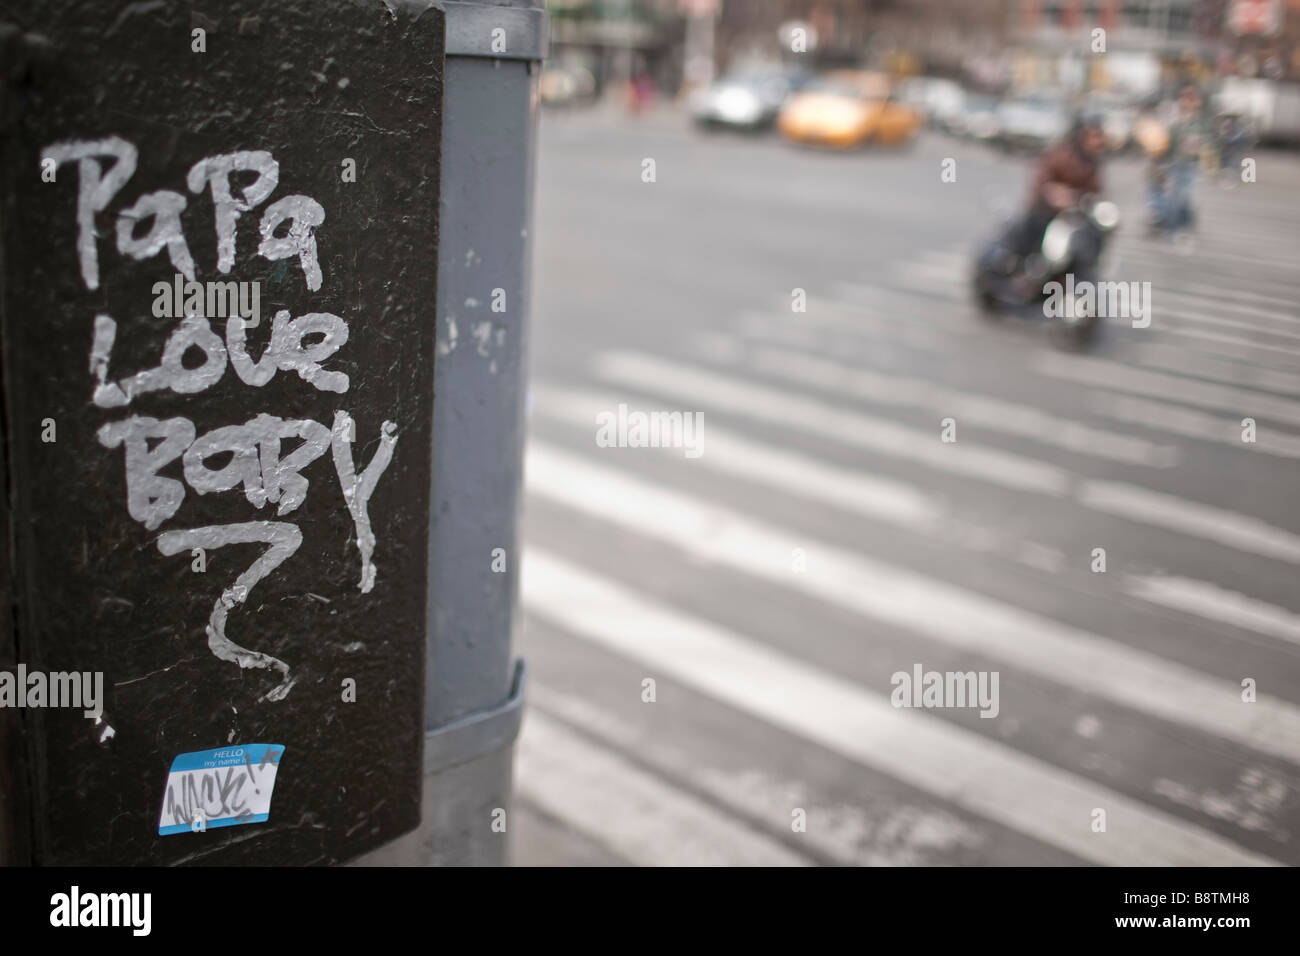 'papa loves baby' graf in new york - Stock Image